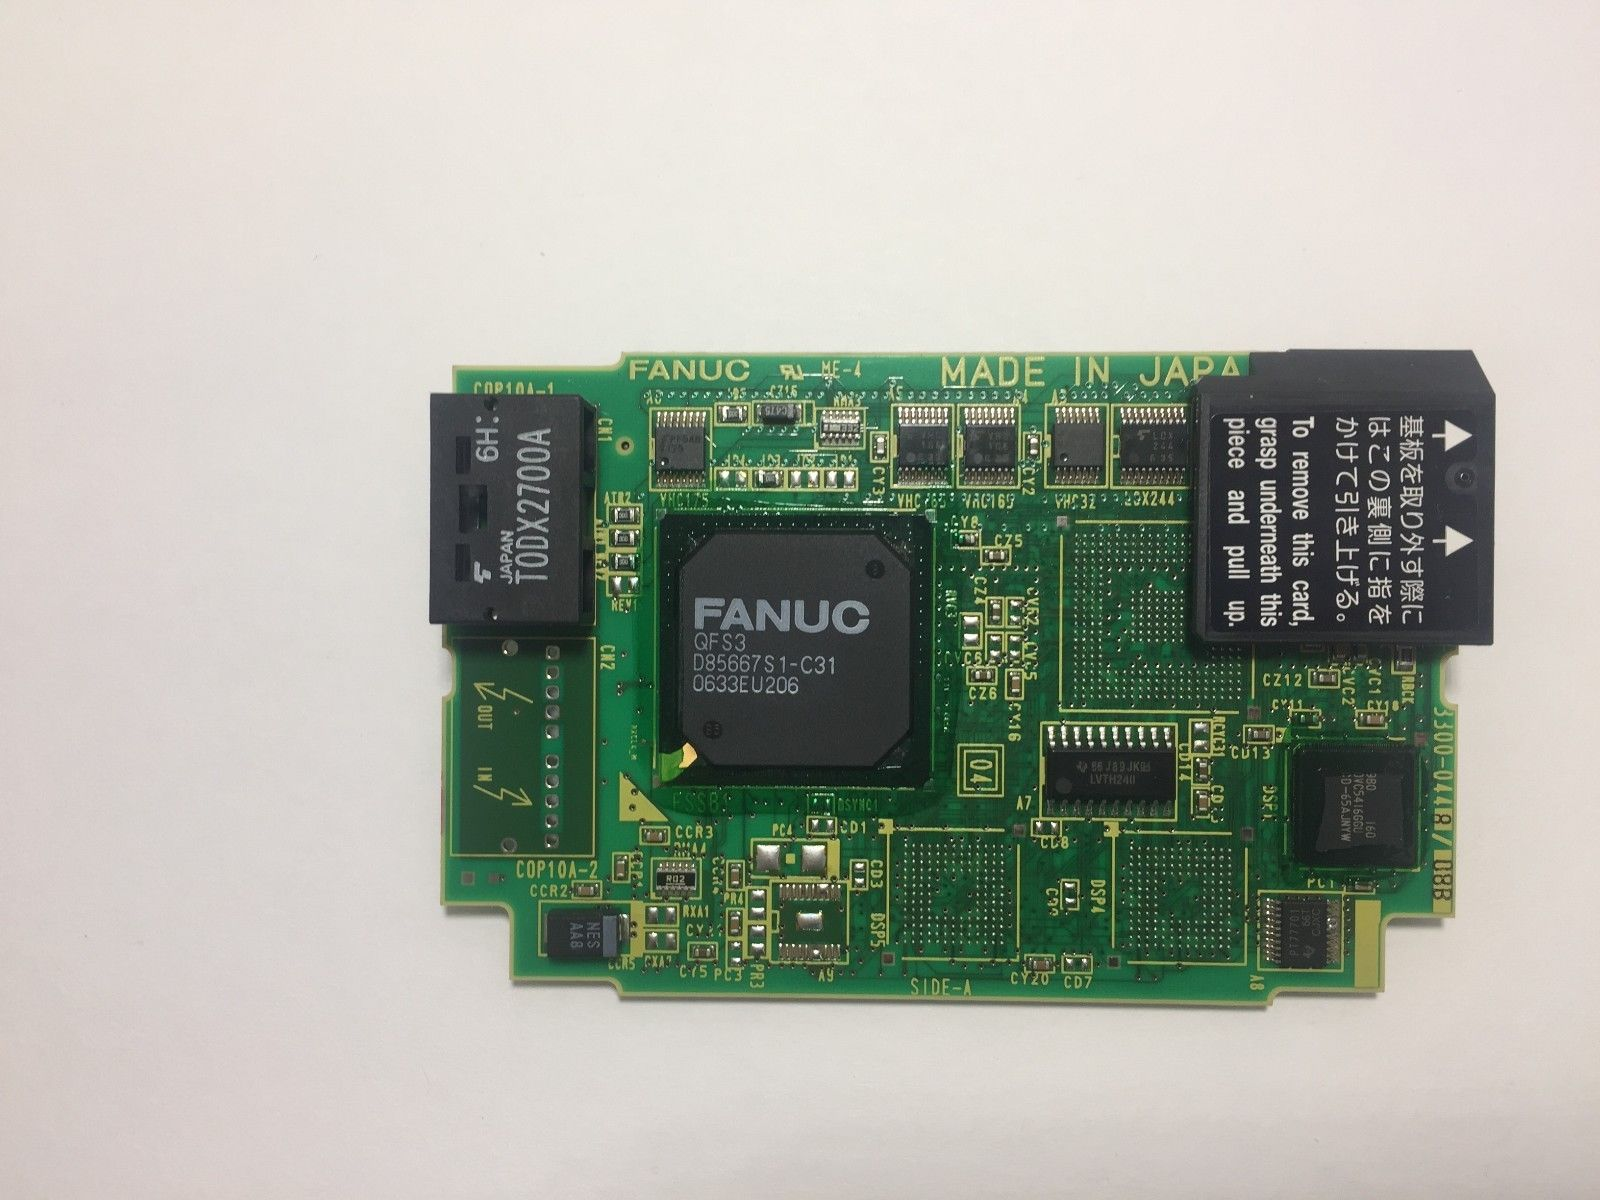 FANUC Control Boards